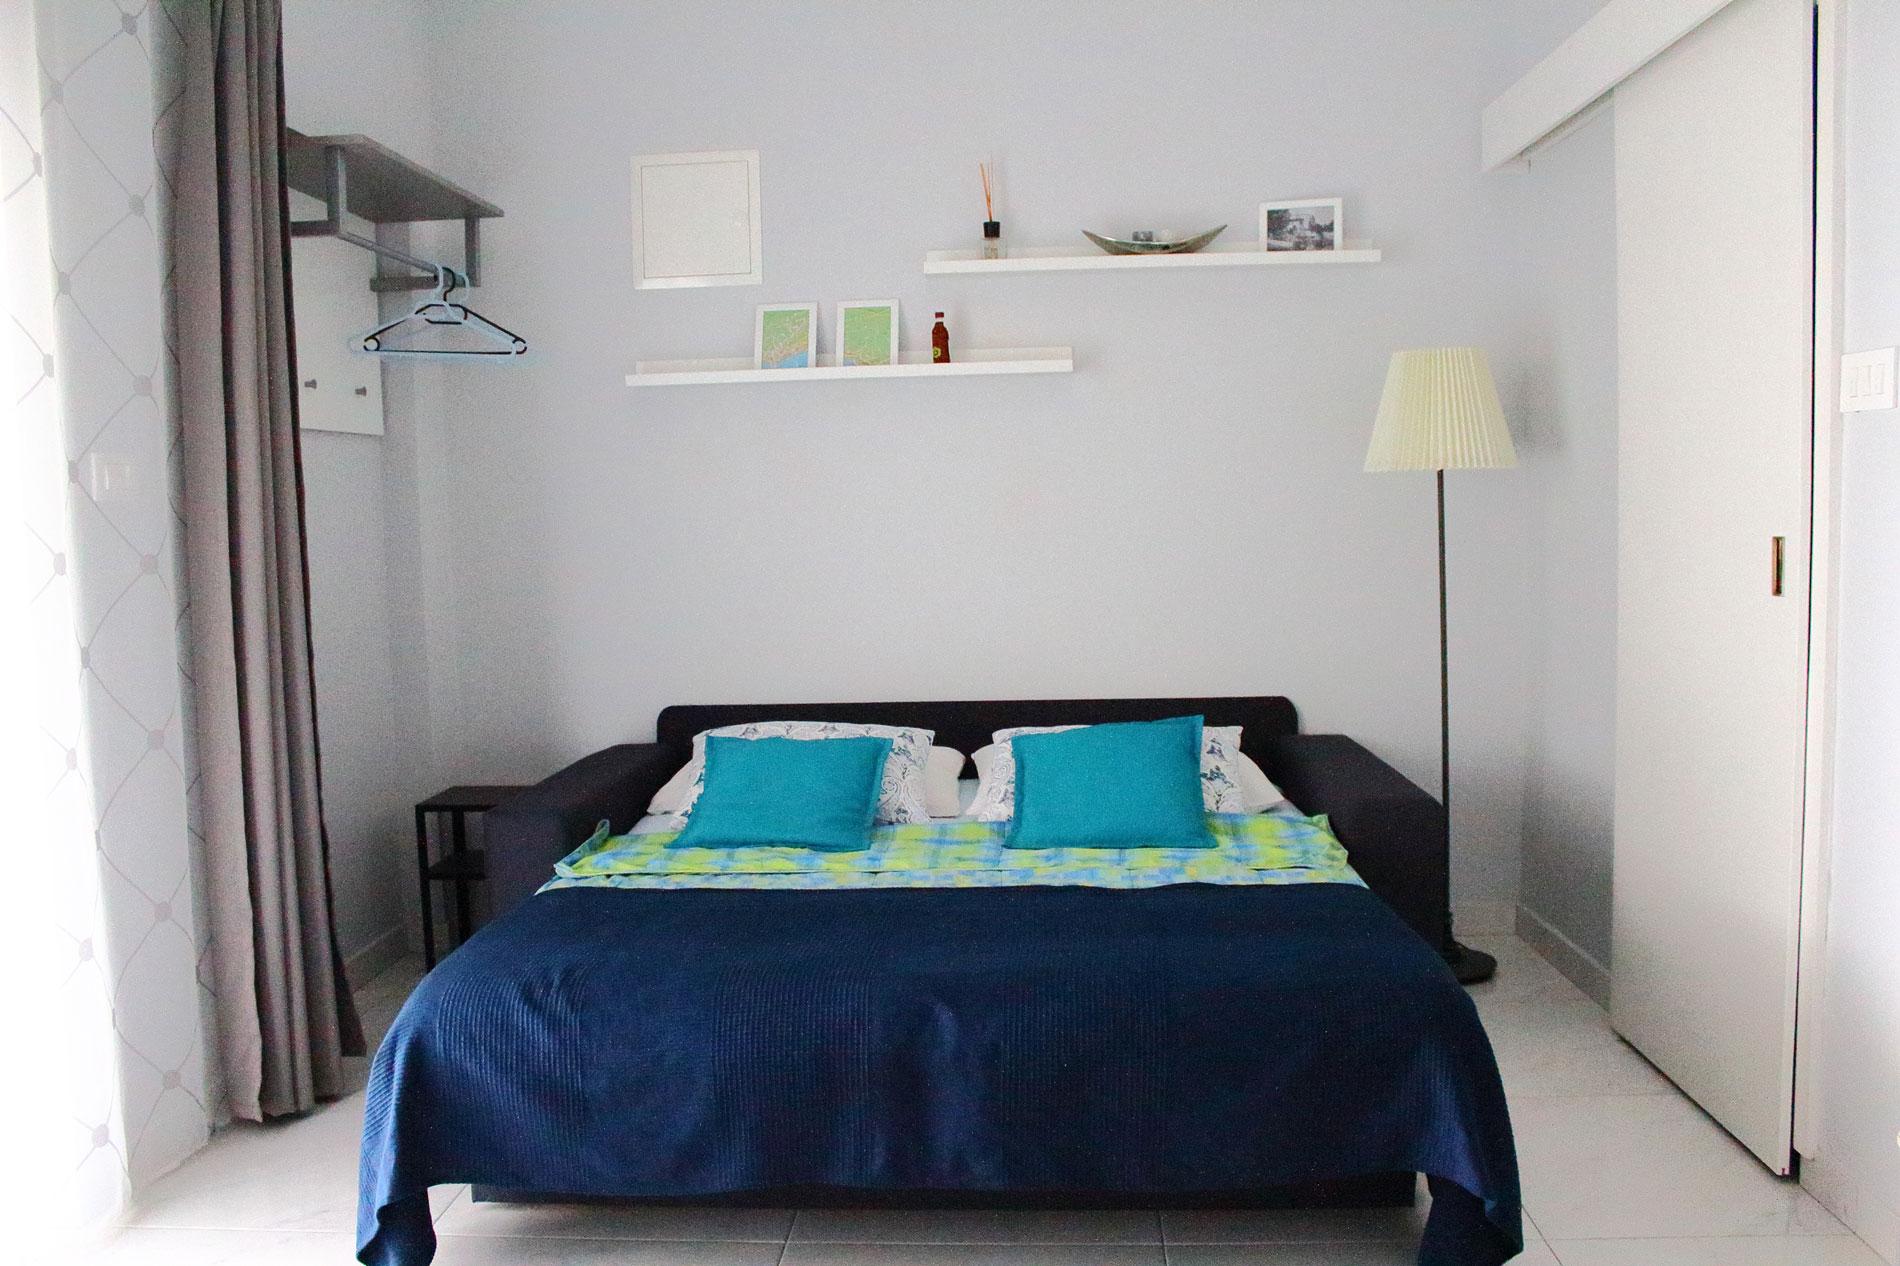 Apartments Basan Lovran-Opatija, apartment 2+2 extra bed